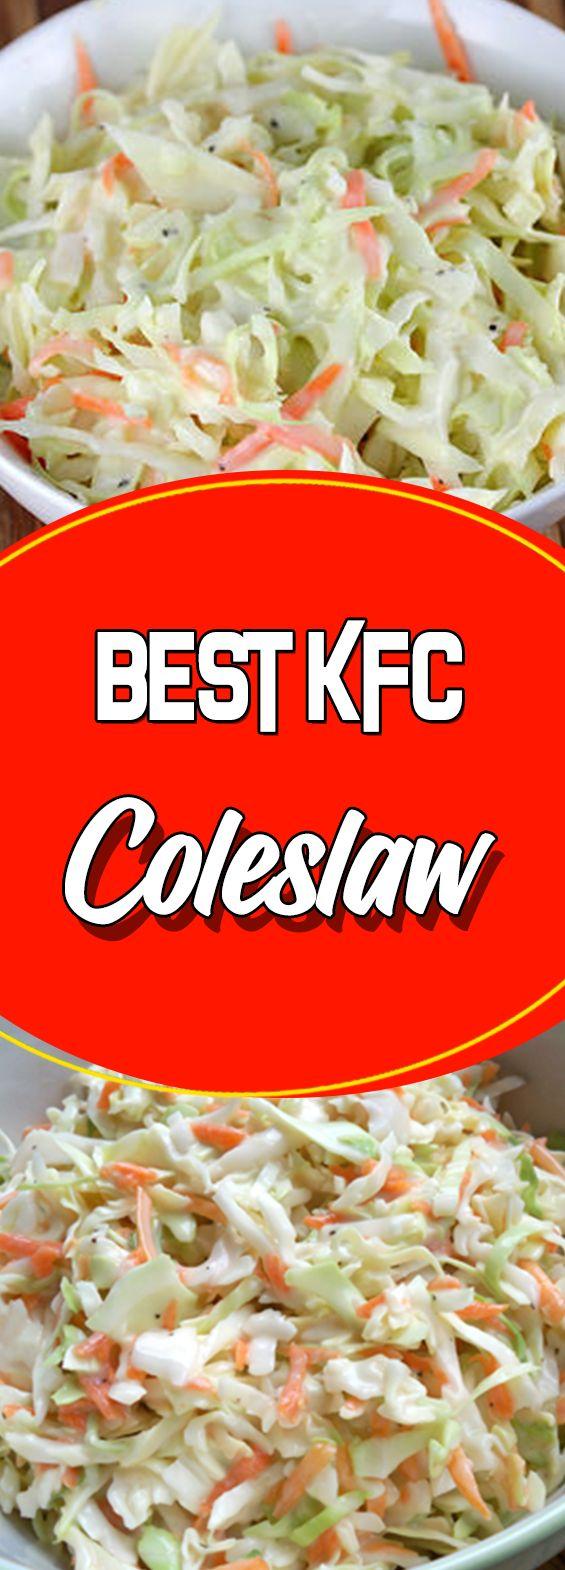 Best KFC Coleslaw #healthyrecipes #cookinglight #recipe #comfortfood #paleo #glutenfree